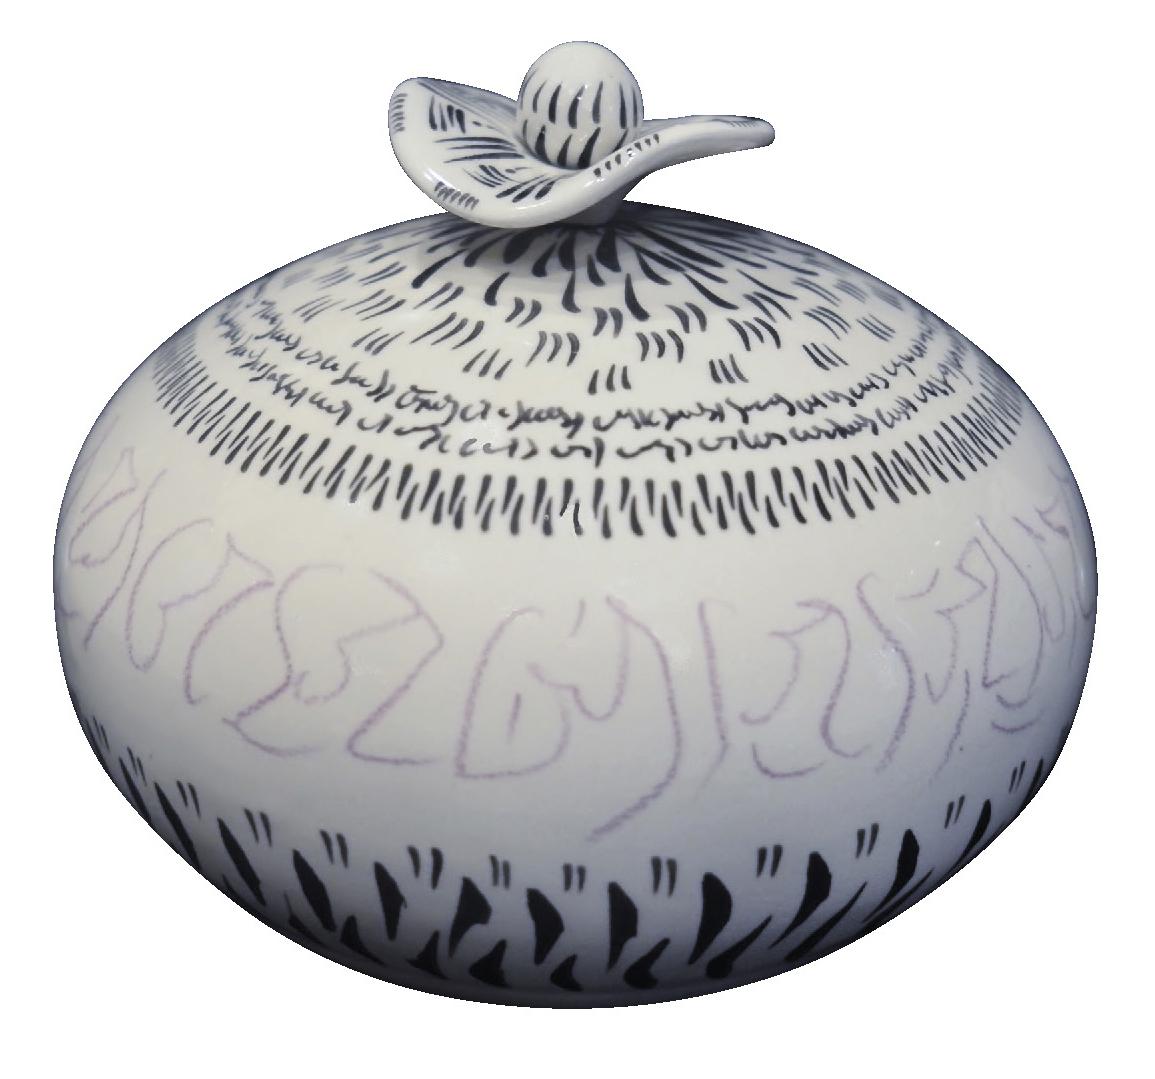 Lot 17 - Eli Gerard (1953) Poc 322 - H14 x D16 cm Ceramic, earthenware -